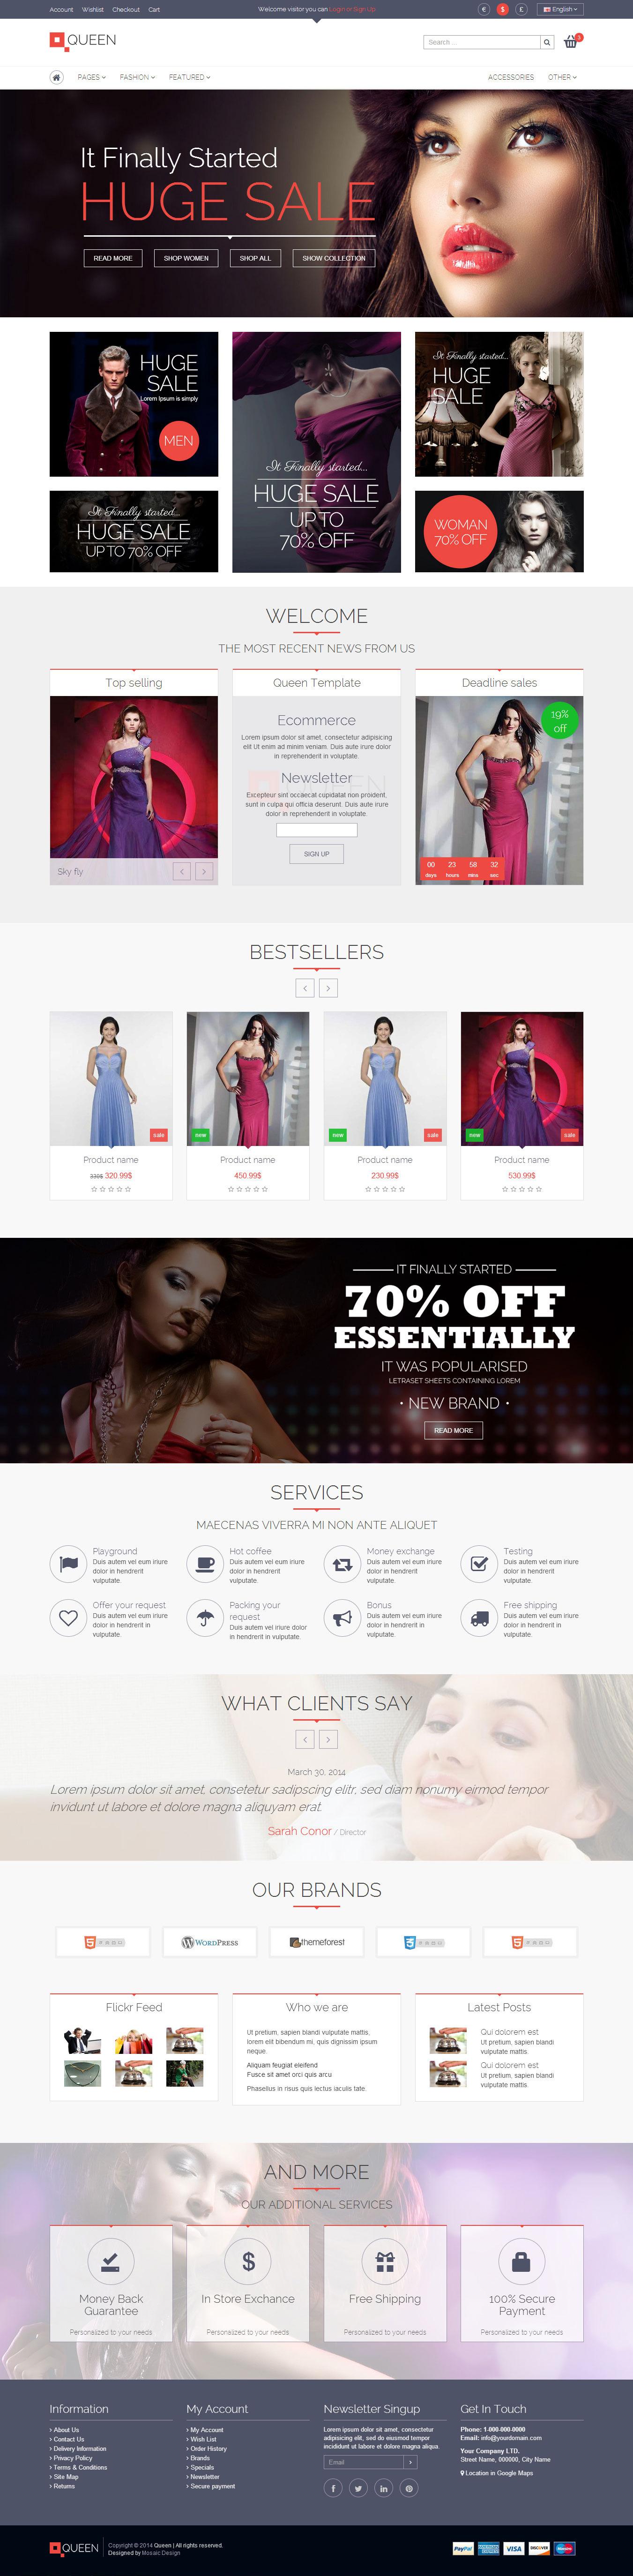 Queen - Responsive E-Commerce Template